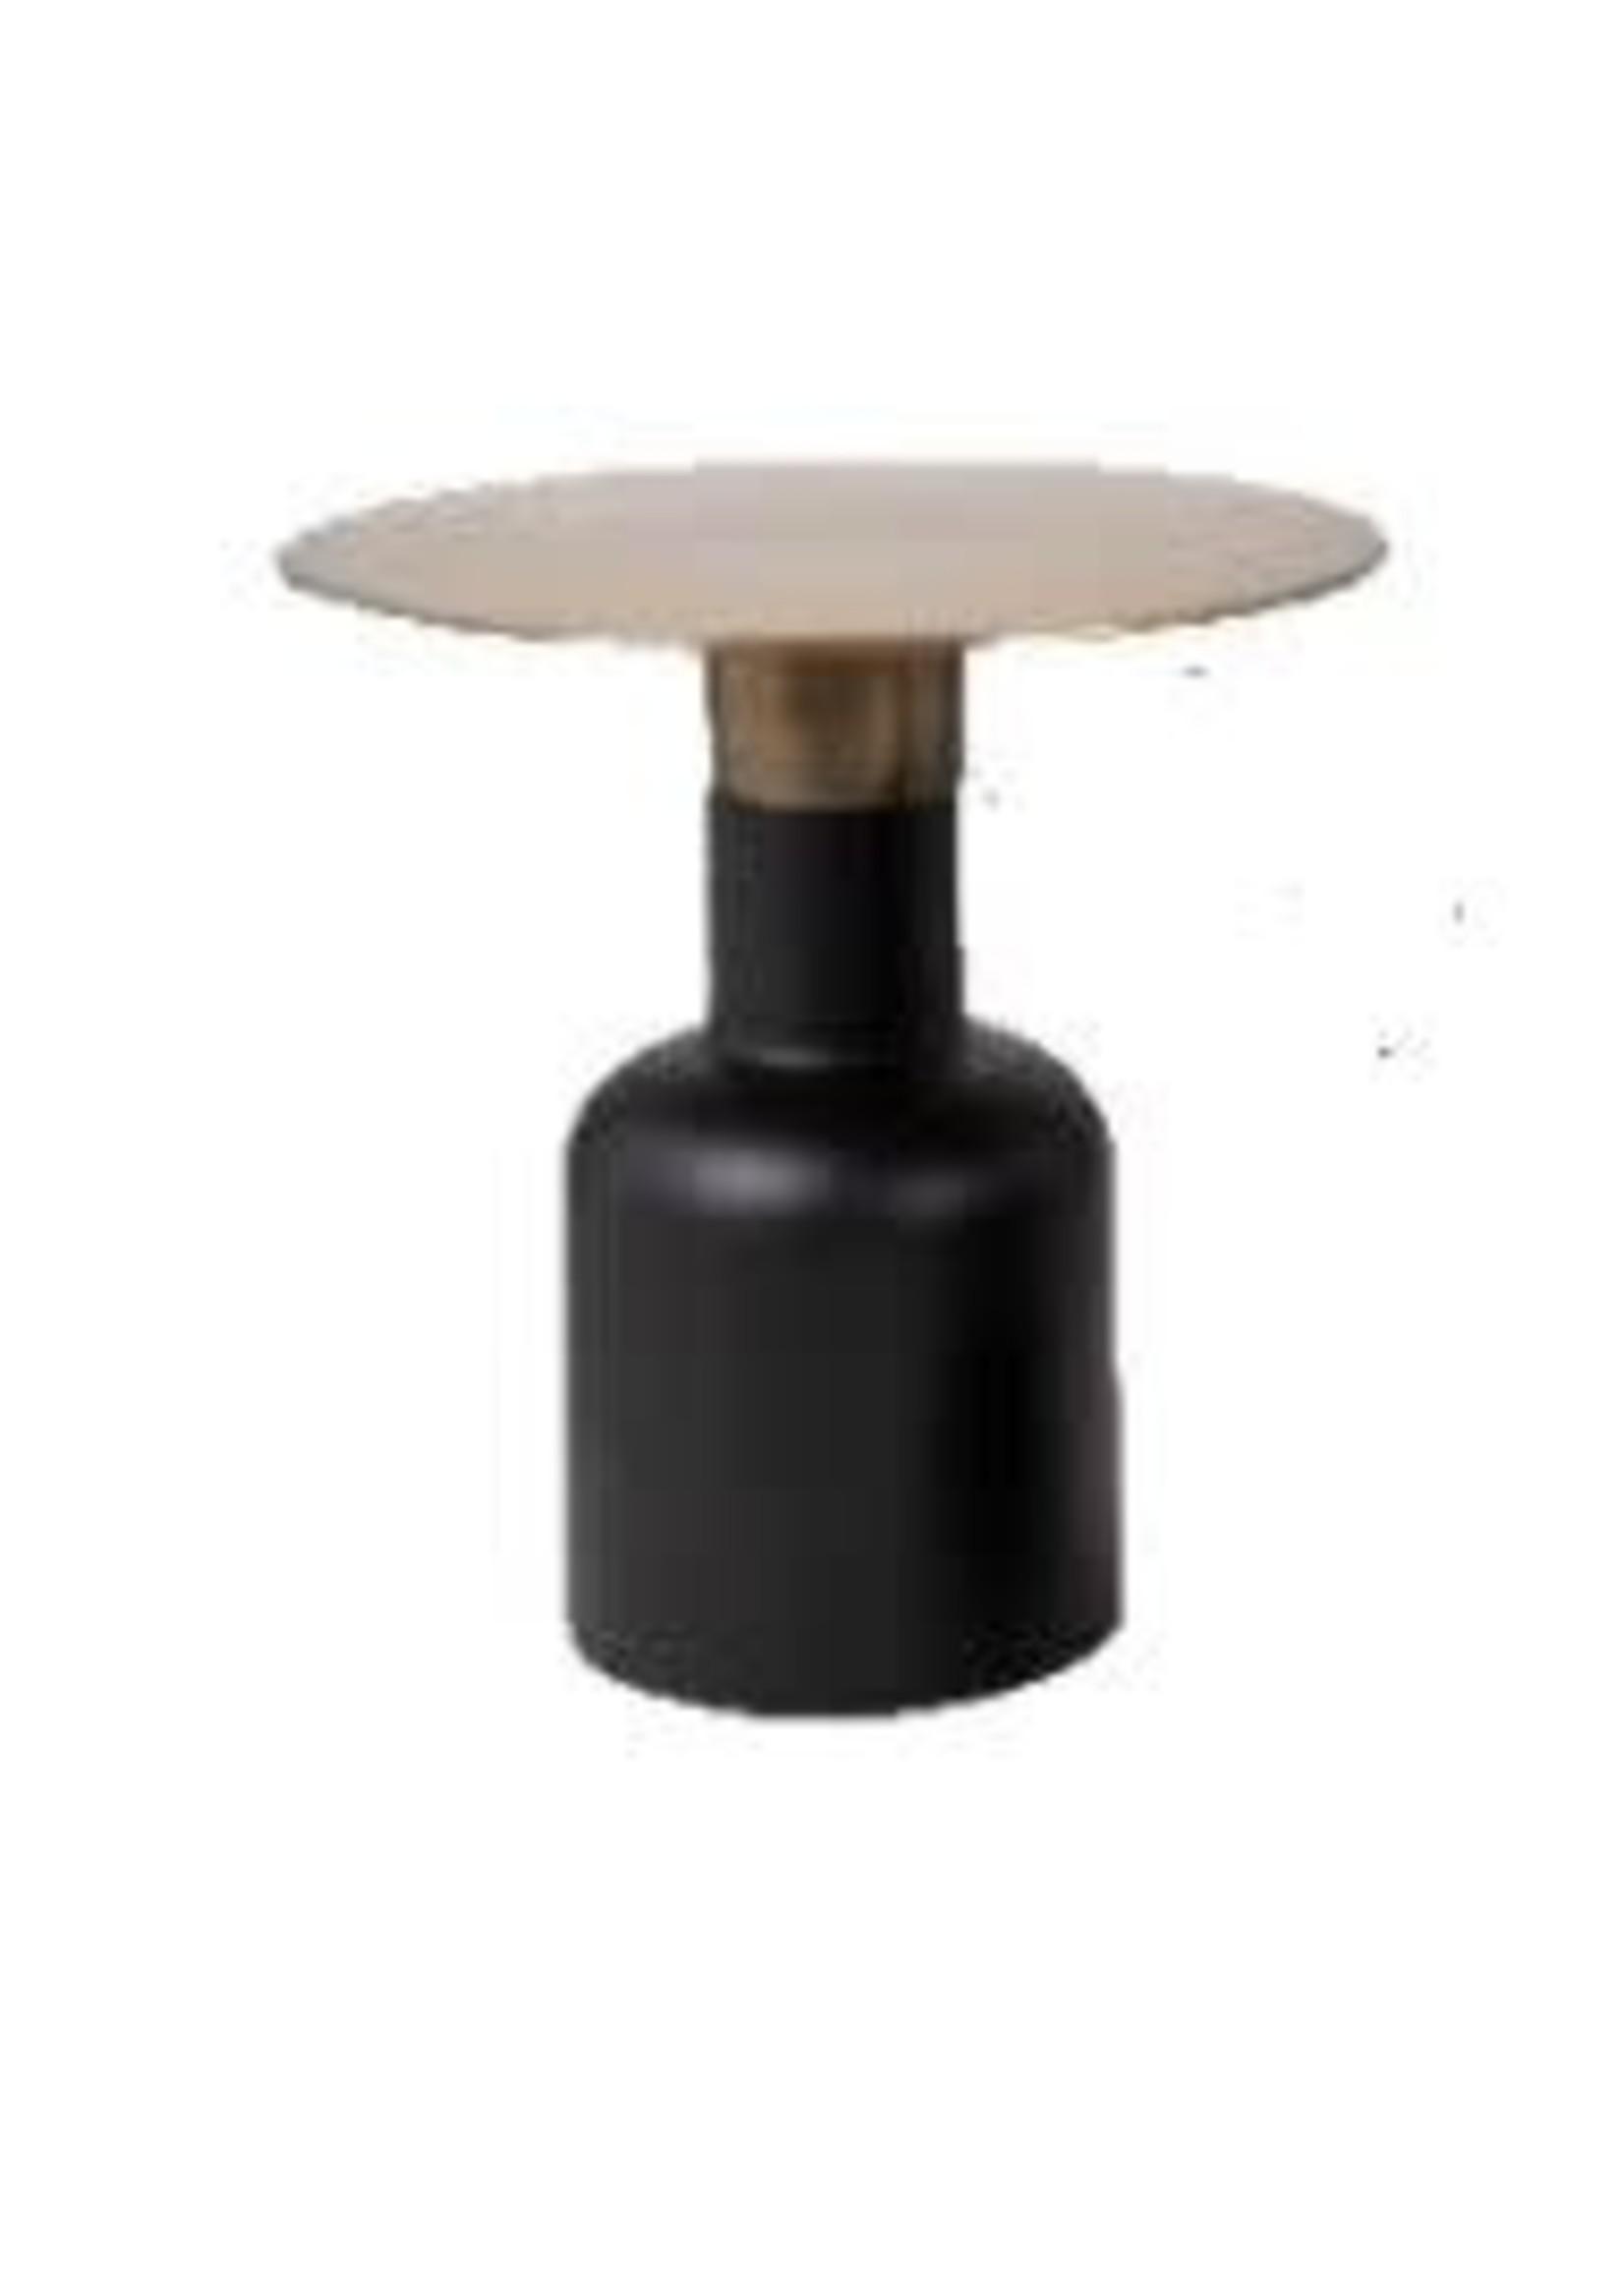 Moods Collection Ronde tafel antique goud&mat zwart alu 45x45x45